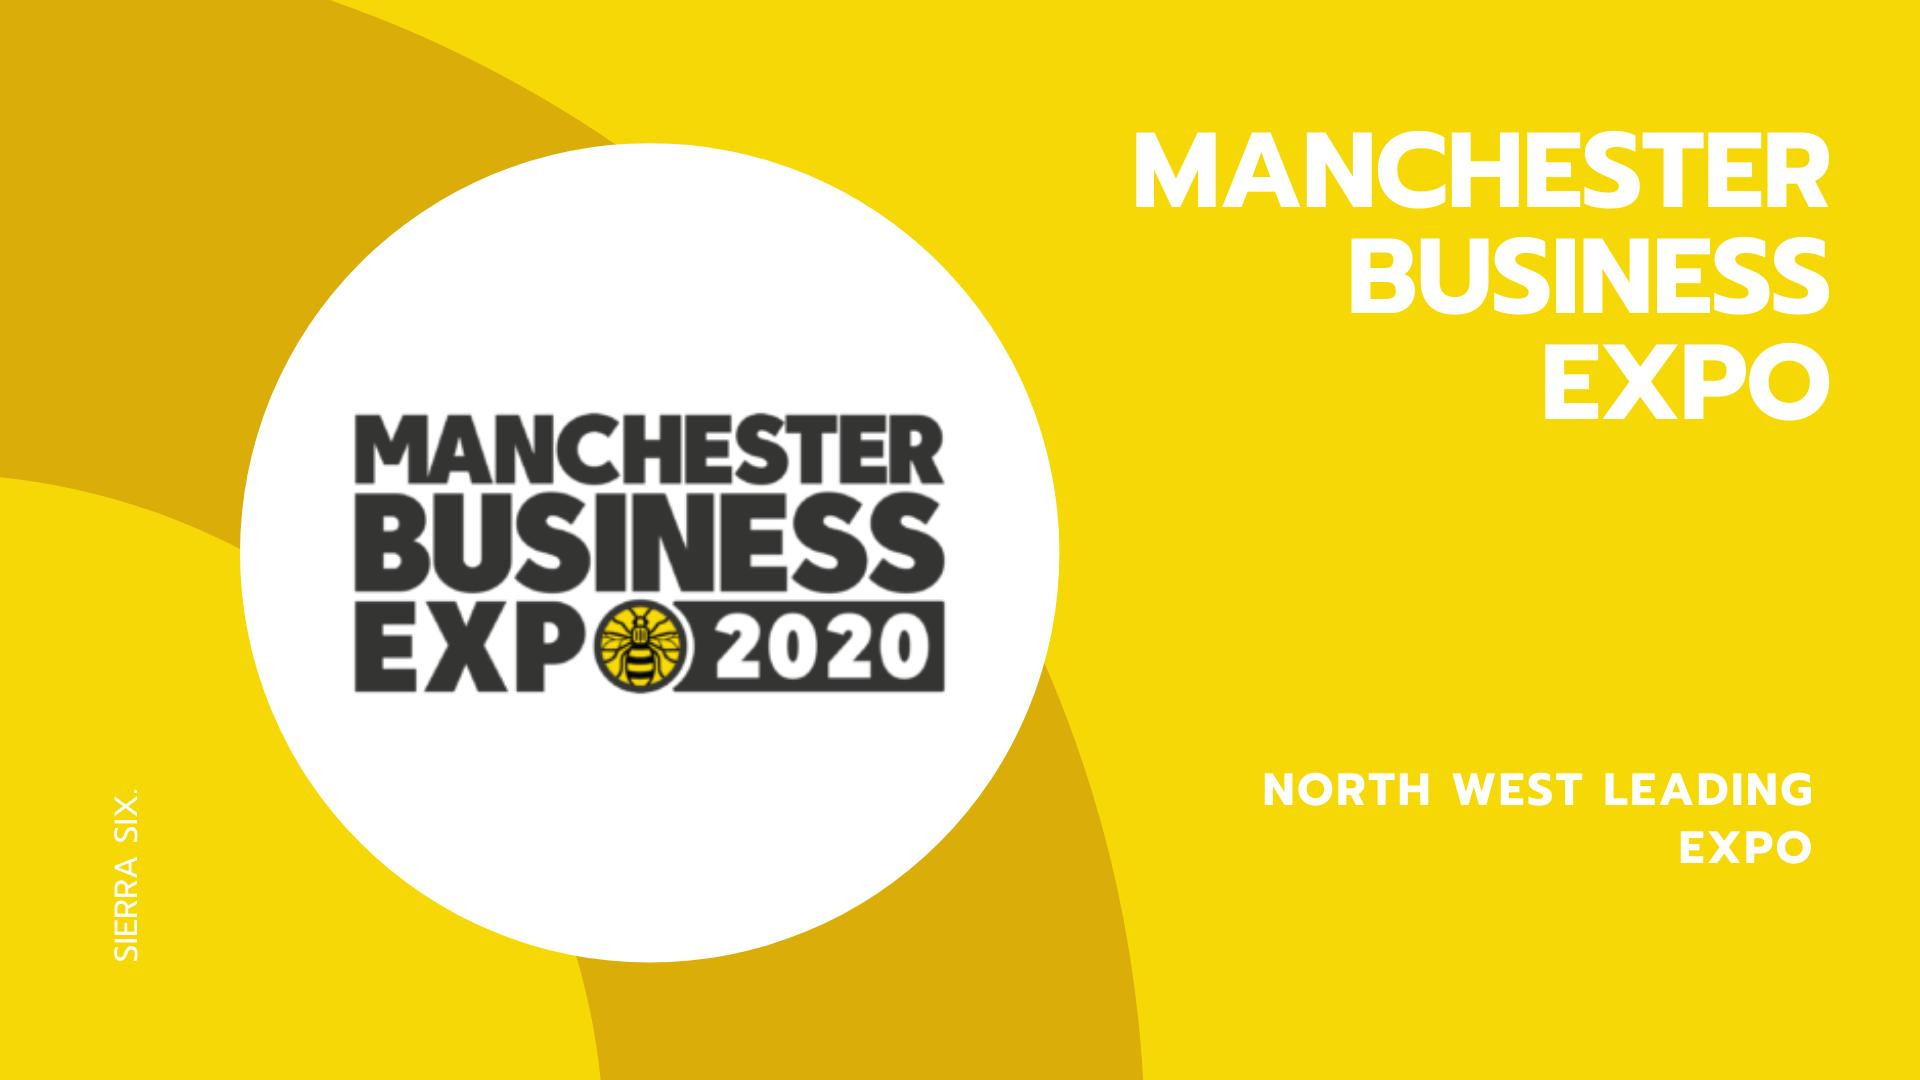 Sierra Six Media, SEO agency, educational workshops: Manchester Business Expo